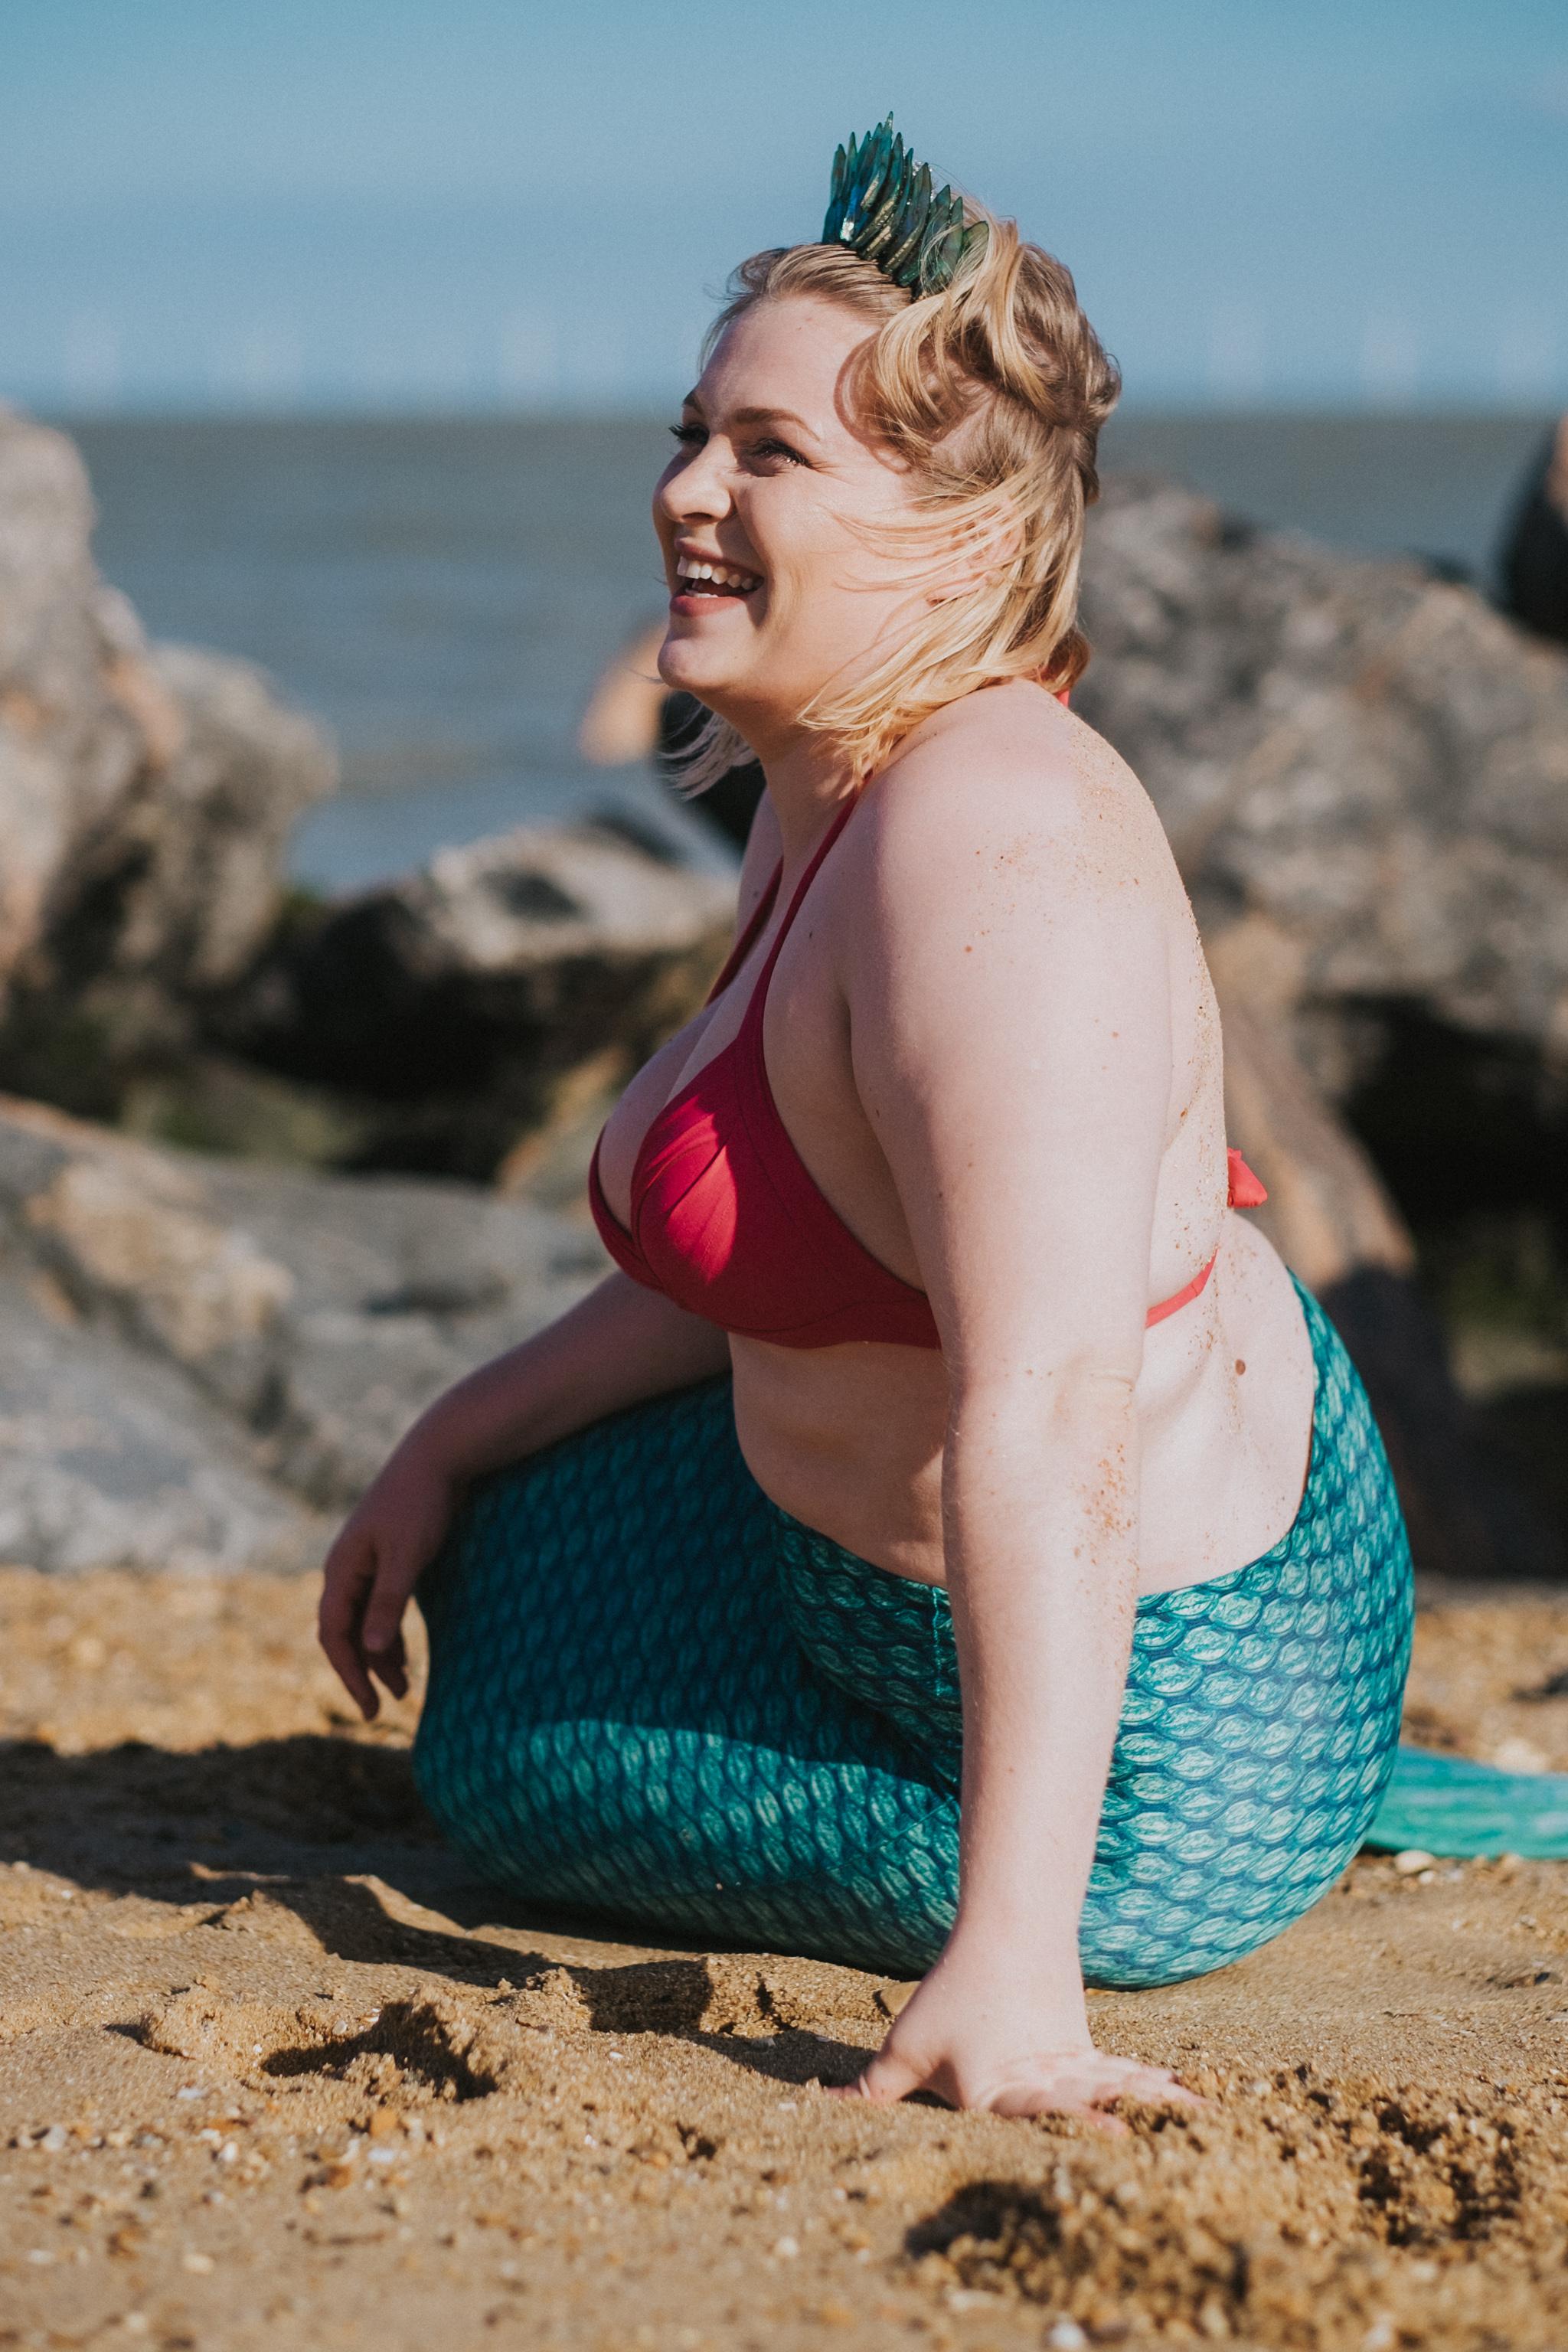 Body-Positive-Mermaids-Grace-Elizabeth-Mermaiding-UK-Alternative-Wedding-Photographer-Colchester-Essex-Suffolk-Norfolk-Devon (46 of 59).jpg